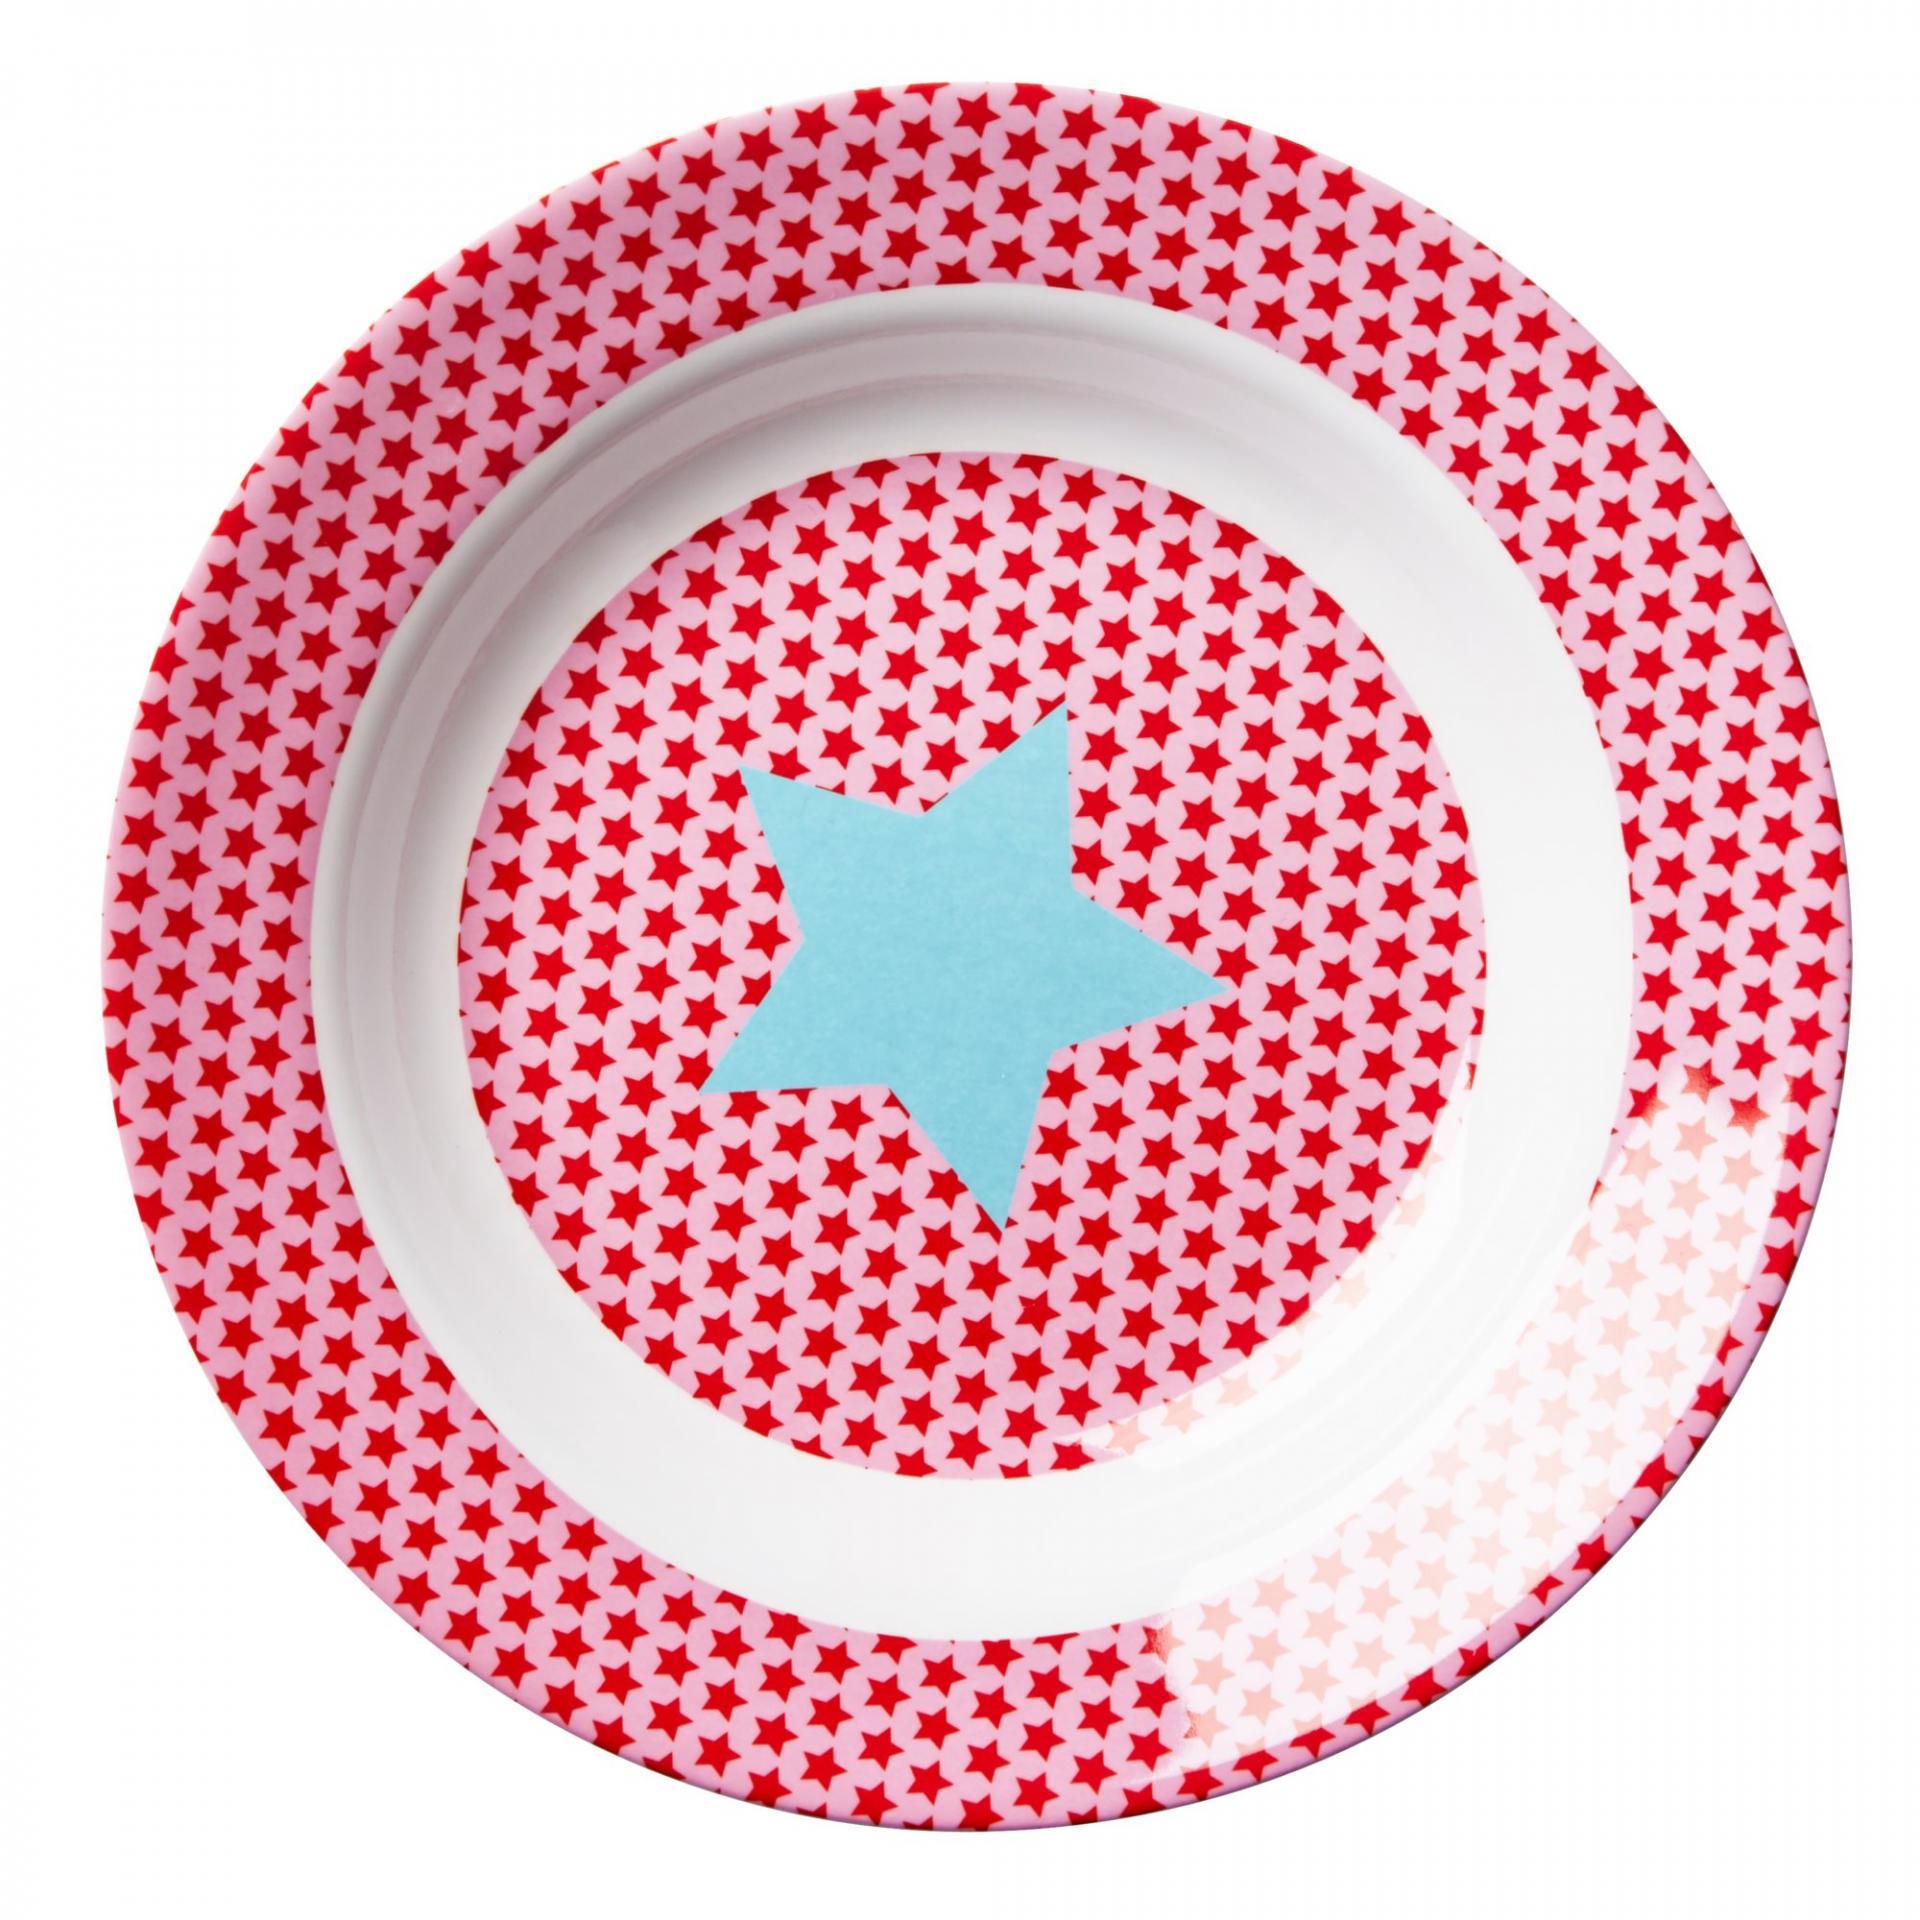 rice Hluboký melaminový talířek Girls star, červená barva, růžová barva, melamin